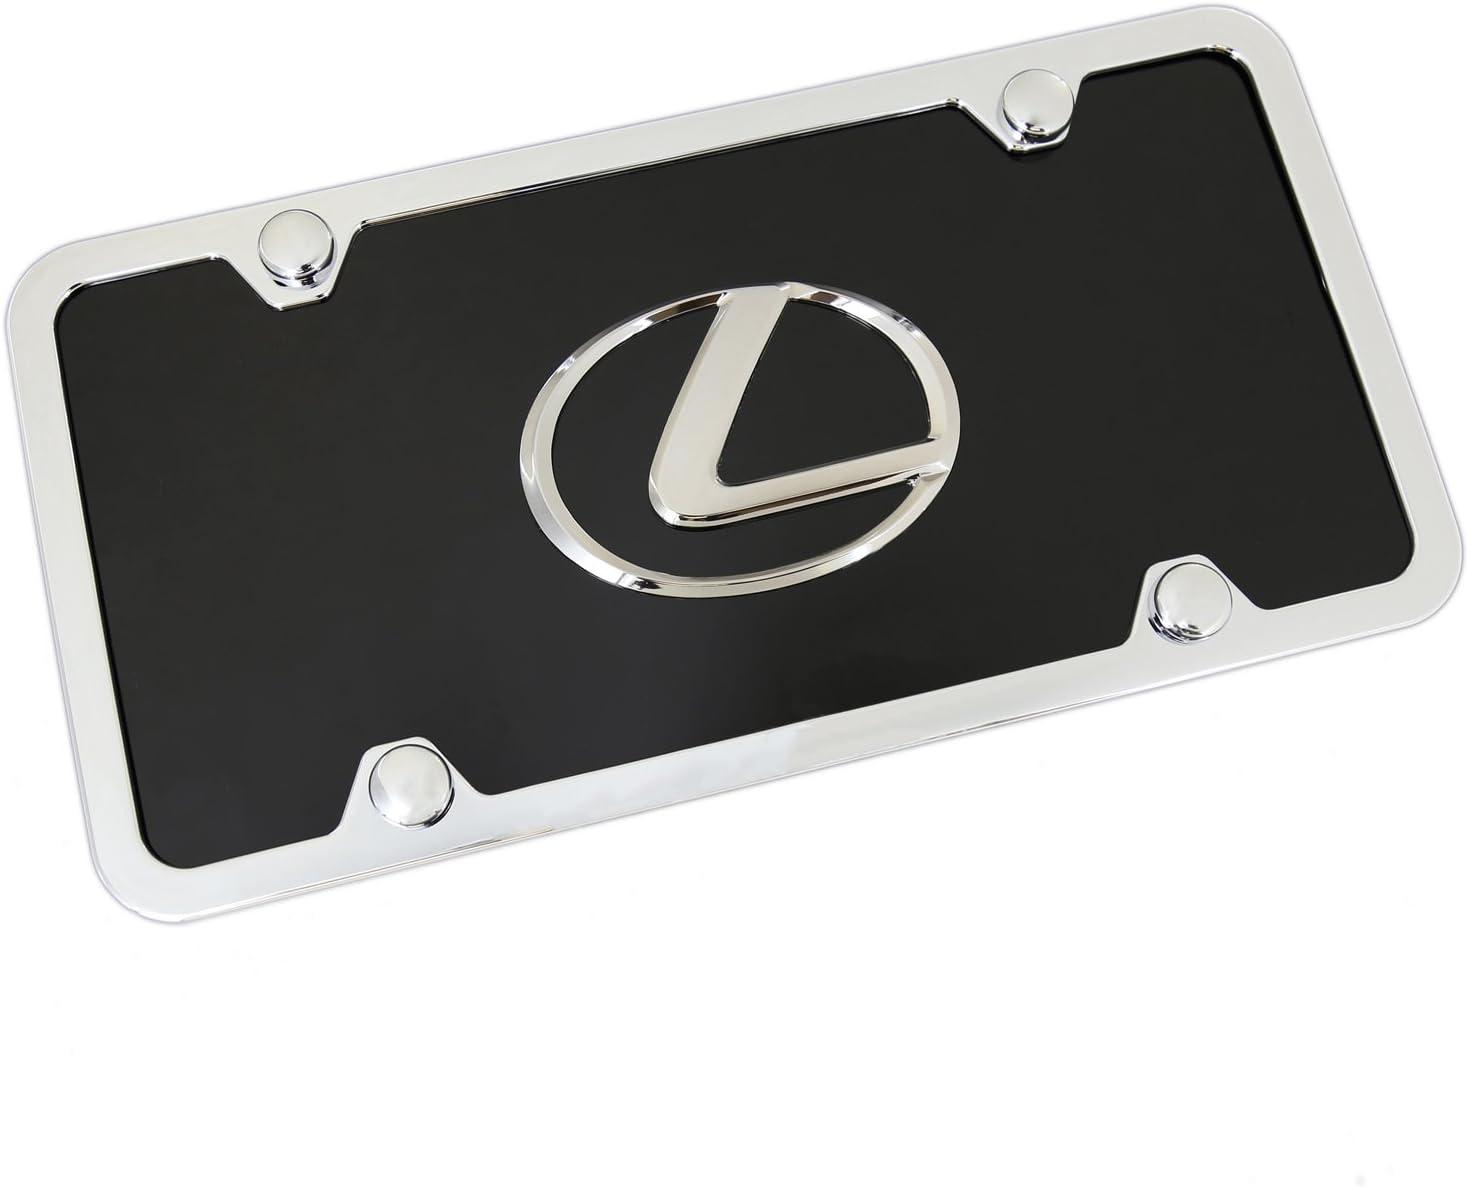 LEXUS Au-Tomotive Gold Inc Chrome Logo Plate License + Black On Finally Portland Mall resale start